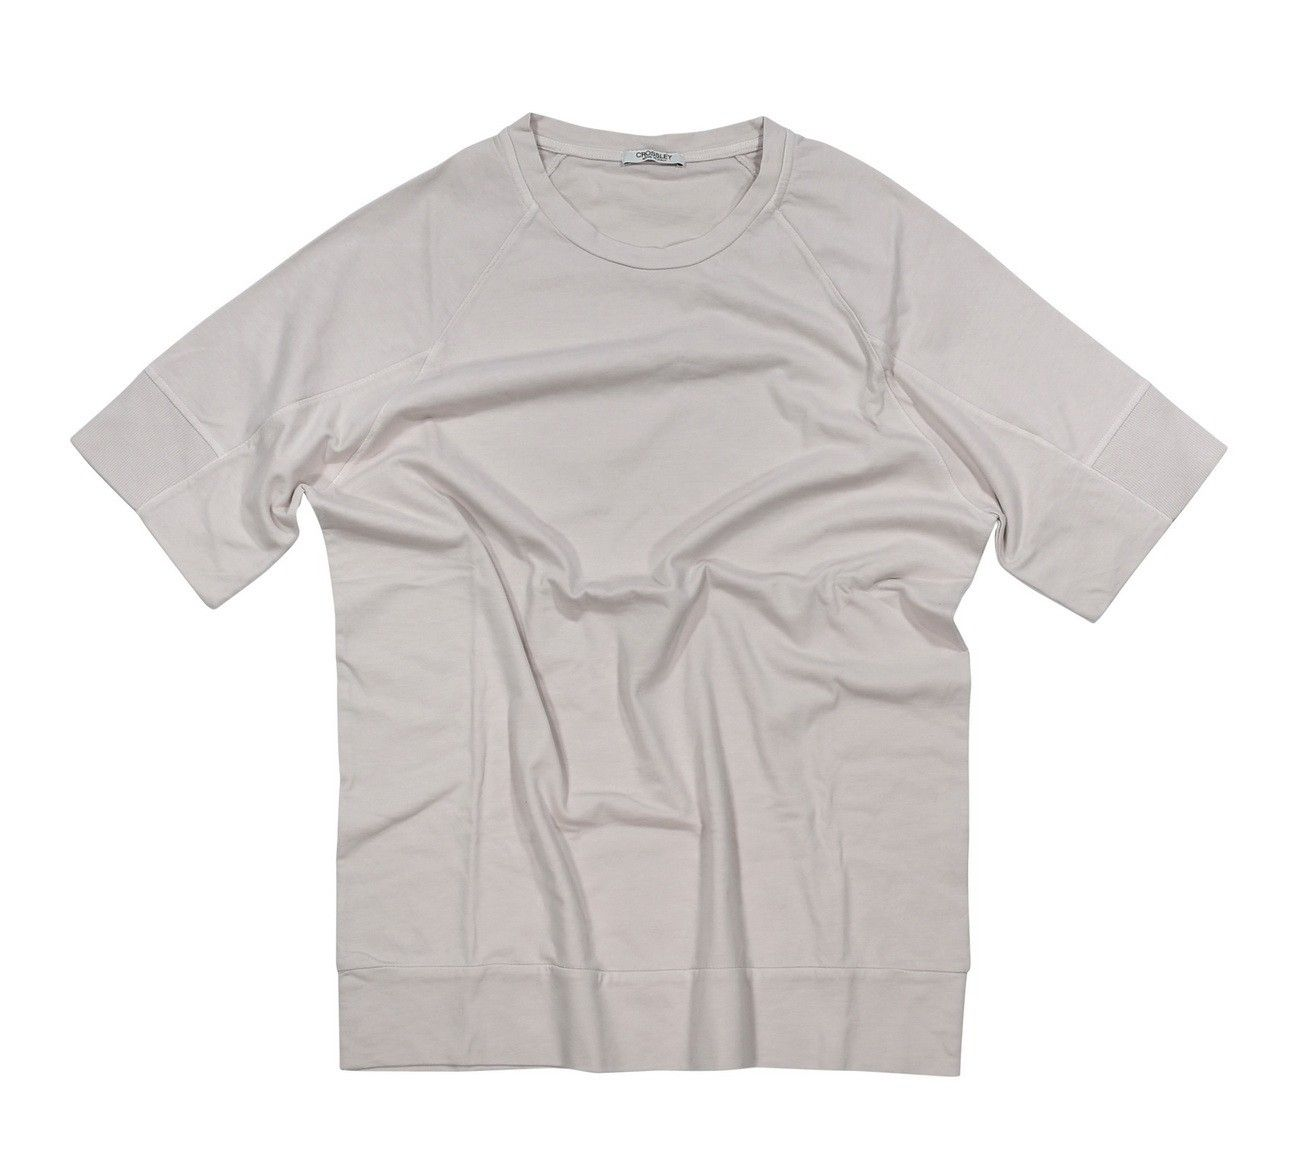 CROSSLEY - Herren T-Shirt - Man Tshirt - Powder